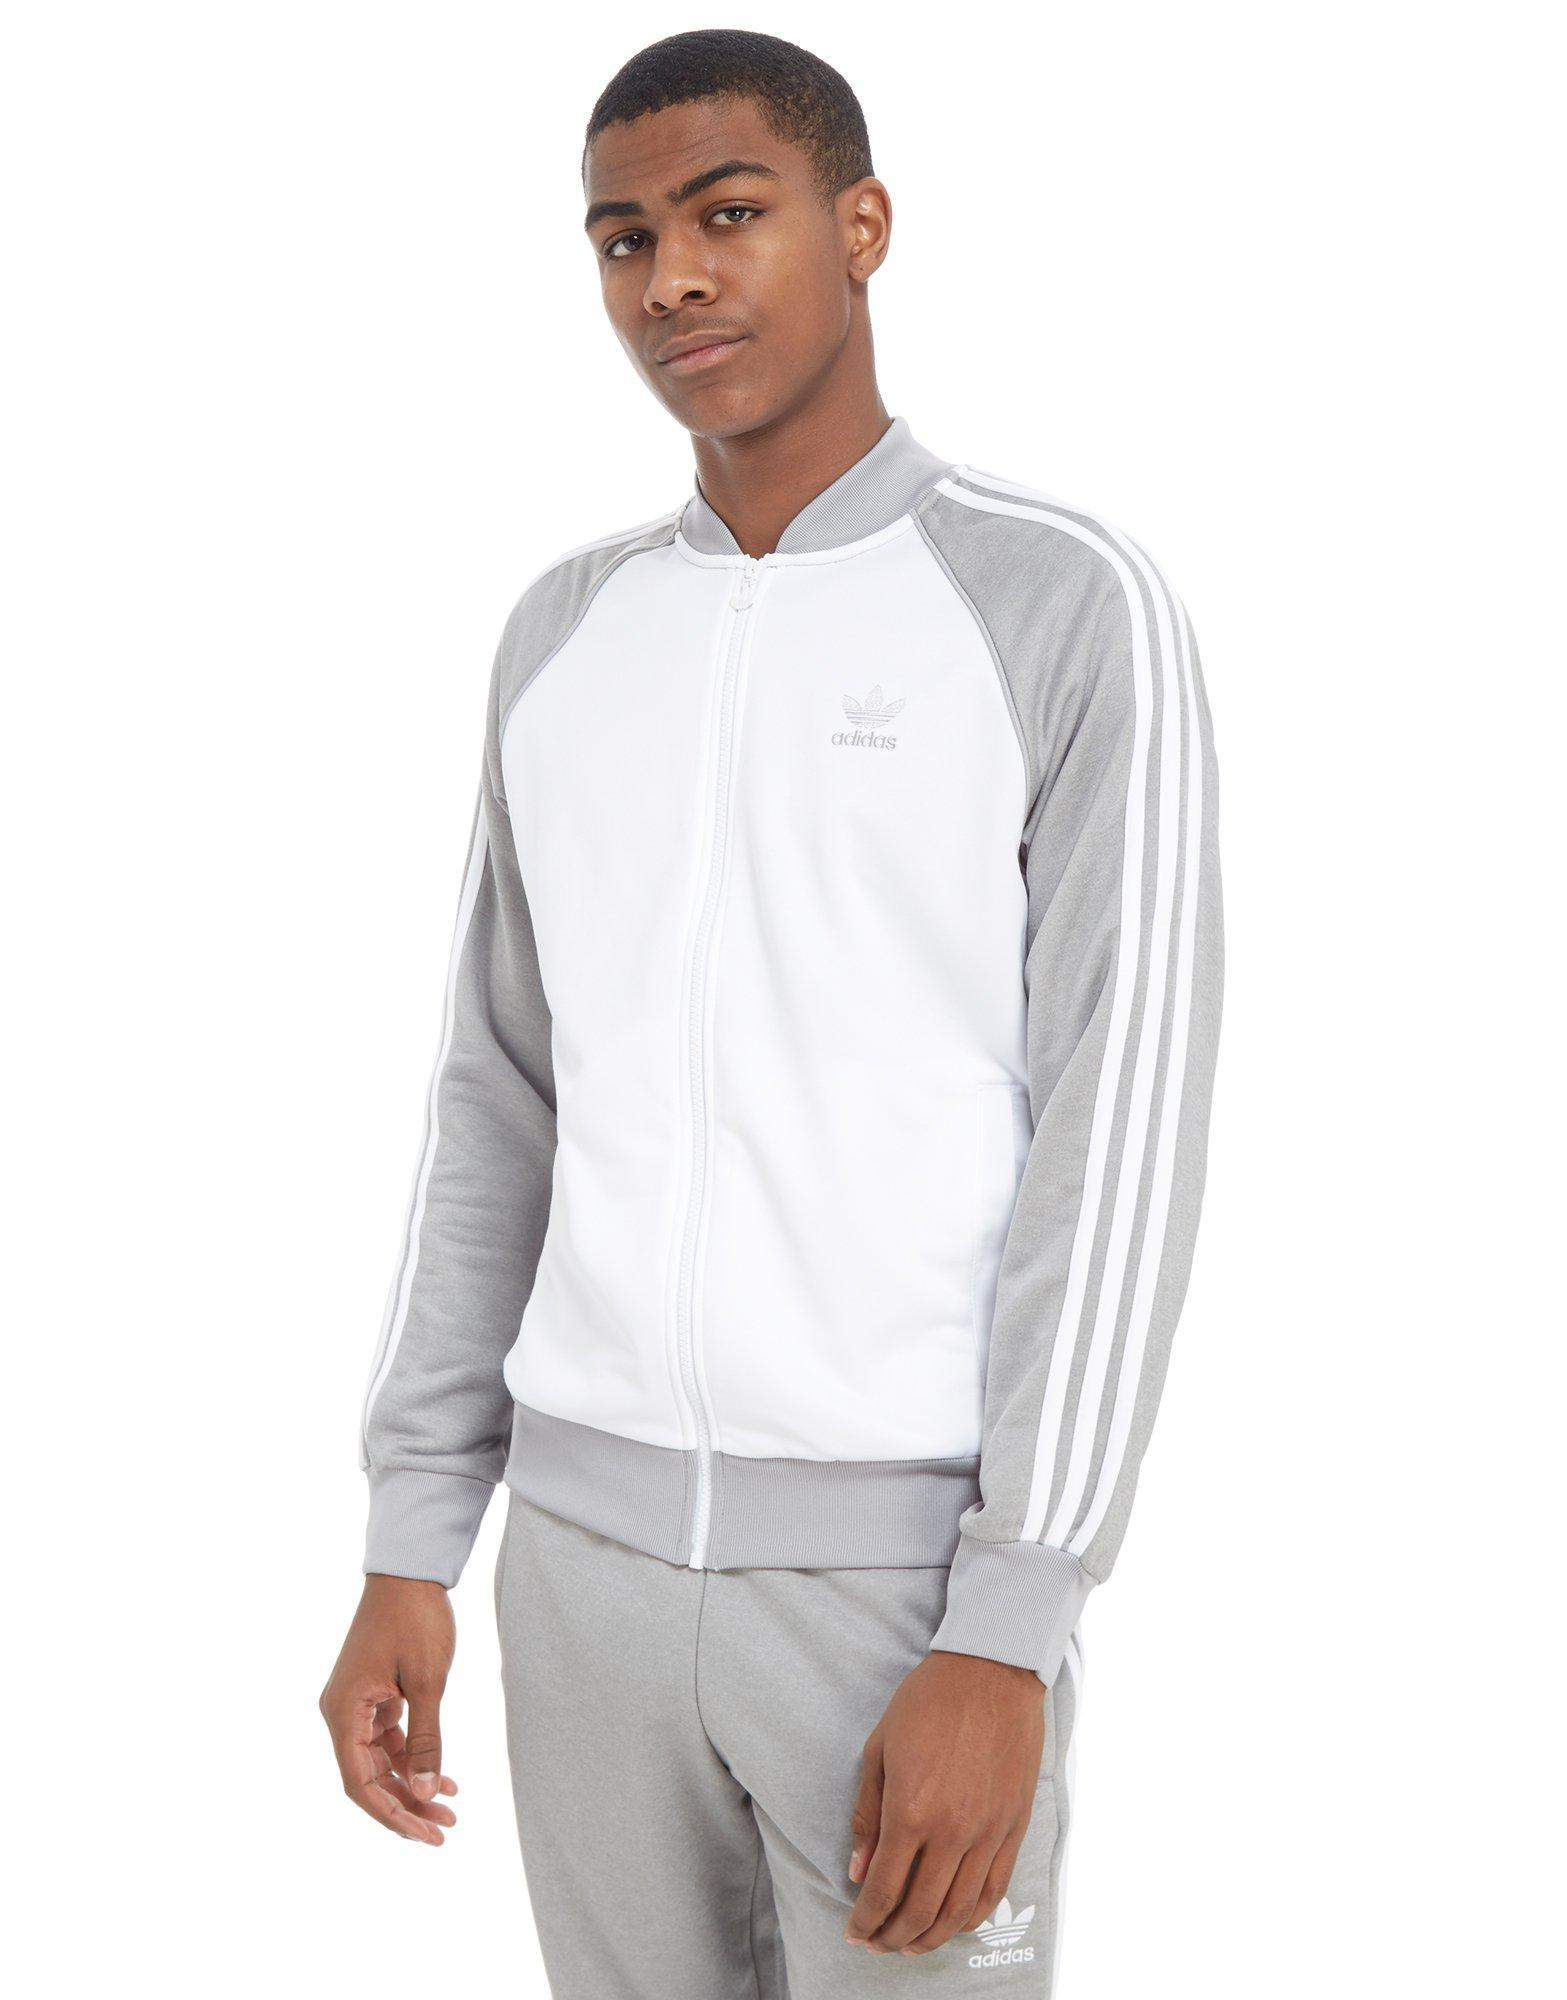 adidas Originals Mens Superstar Track Top Sportswear Mens Sportswear ... f69bf1397